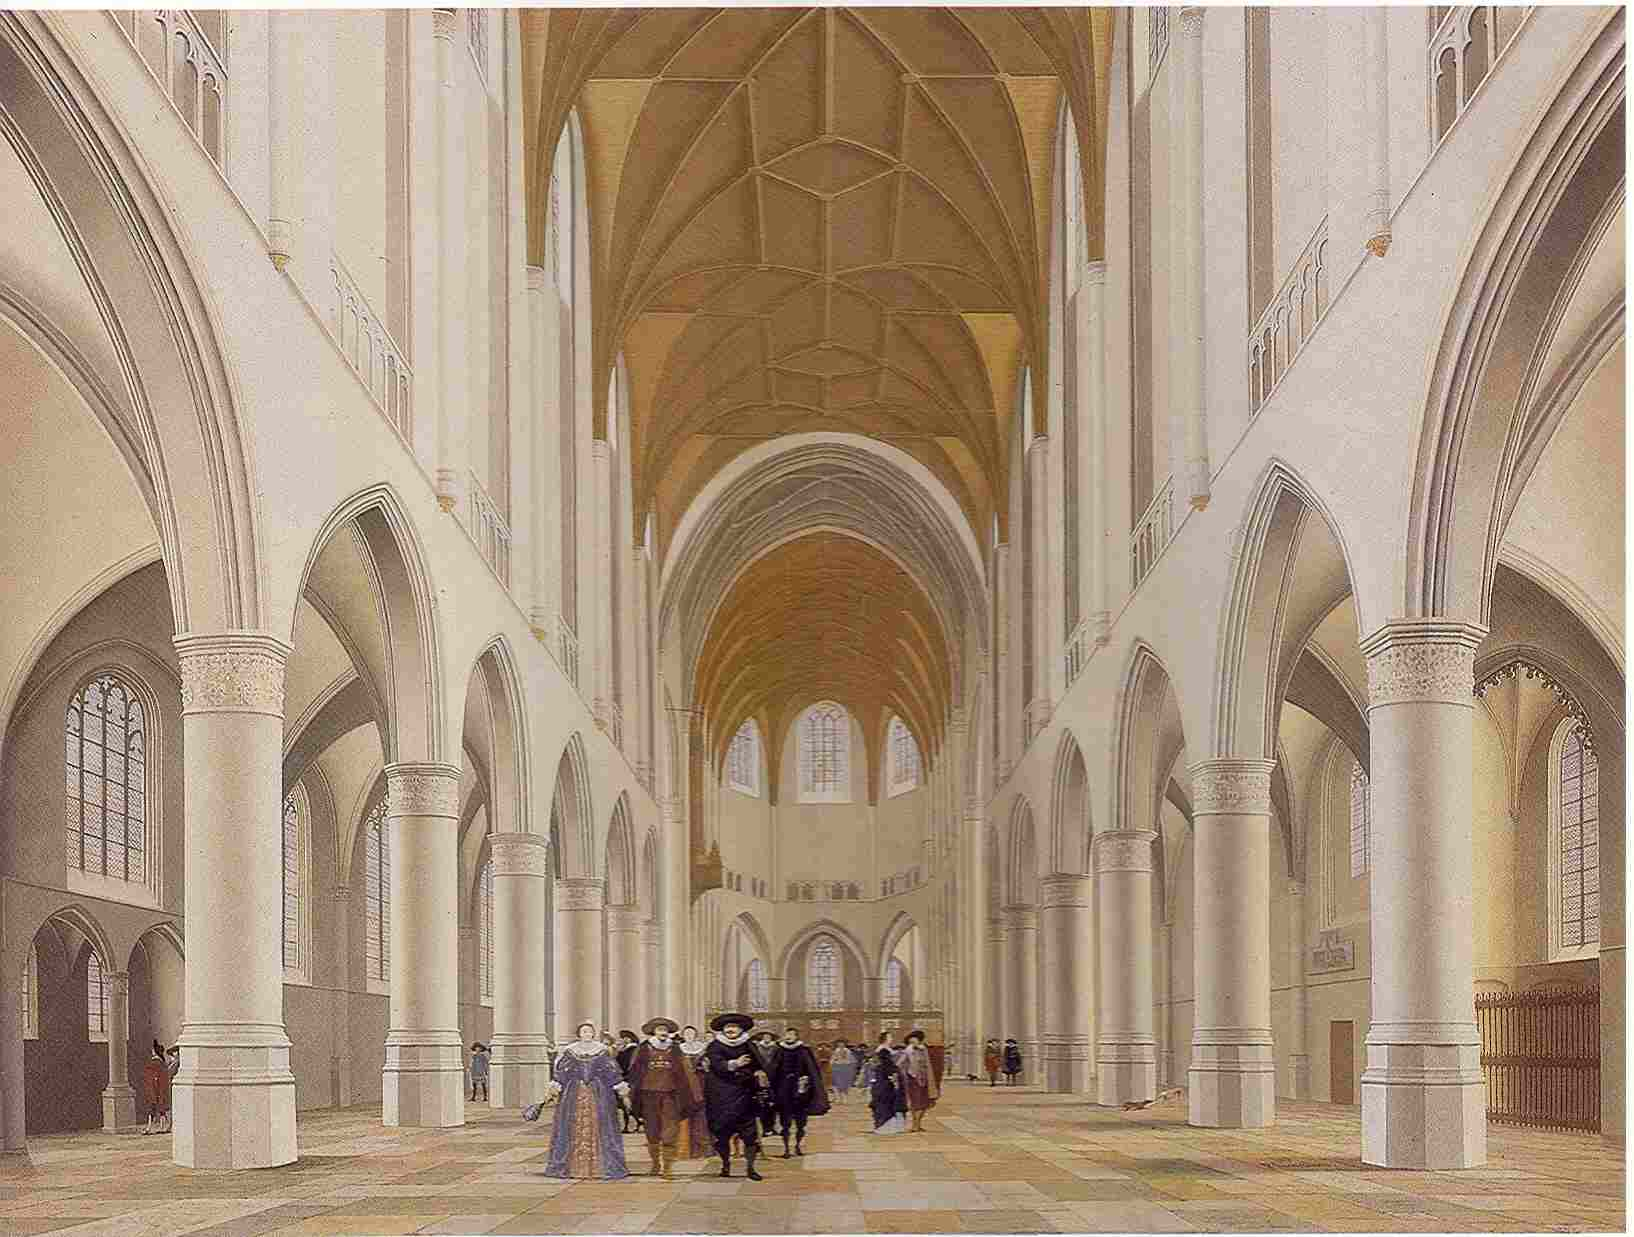 Pieter Saenredam, Interior of the Sint Bavokerk, Haarlem, 1628. Philadelphia, Philadelphia Museum of Art